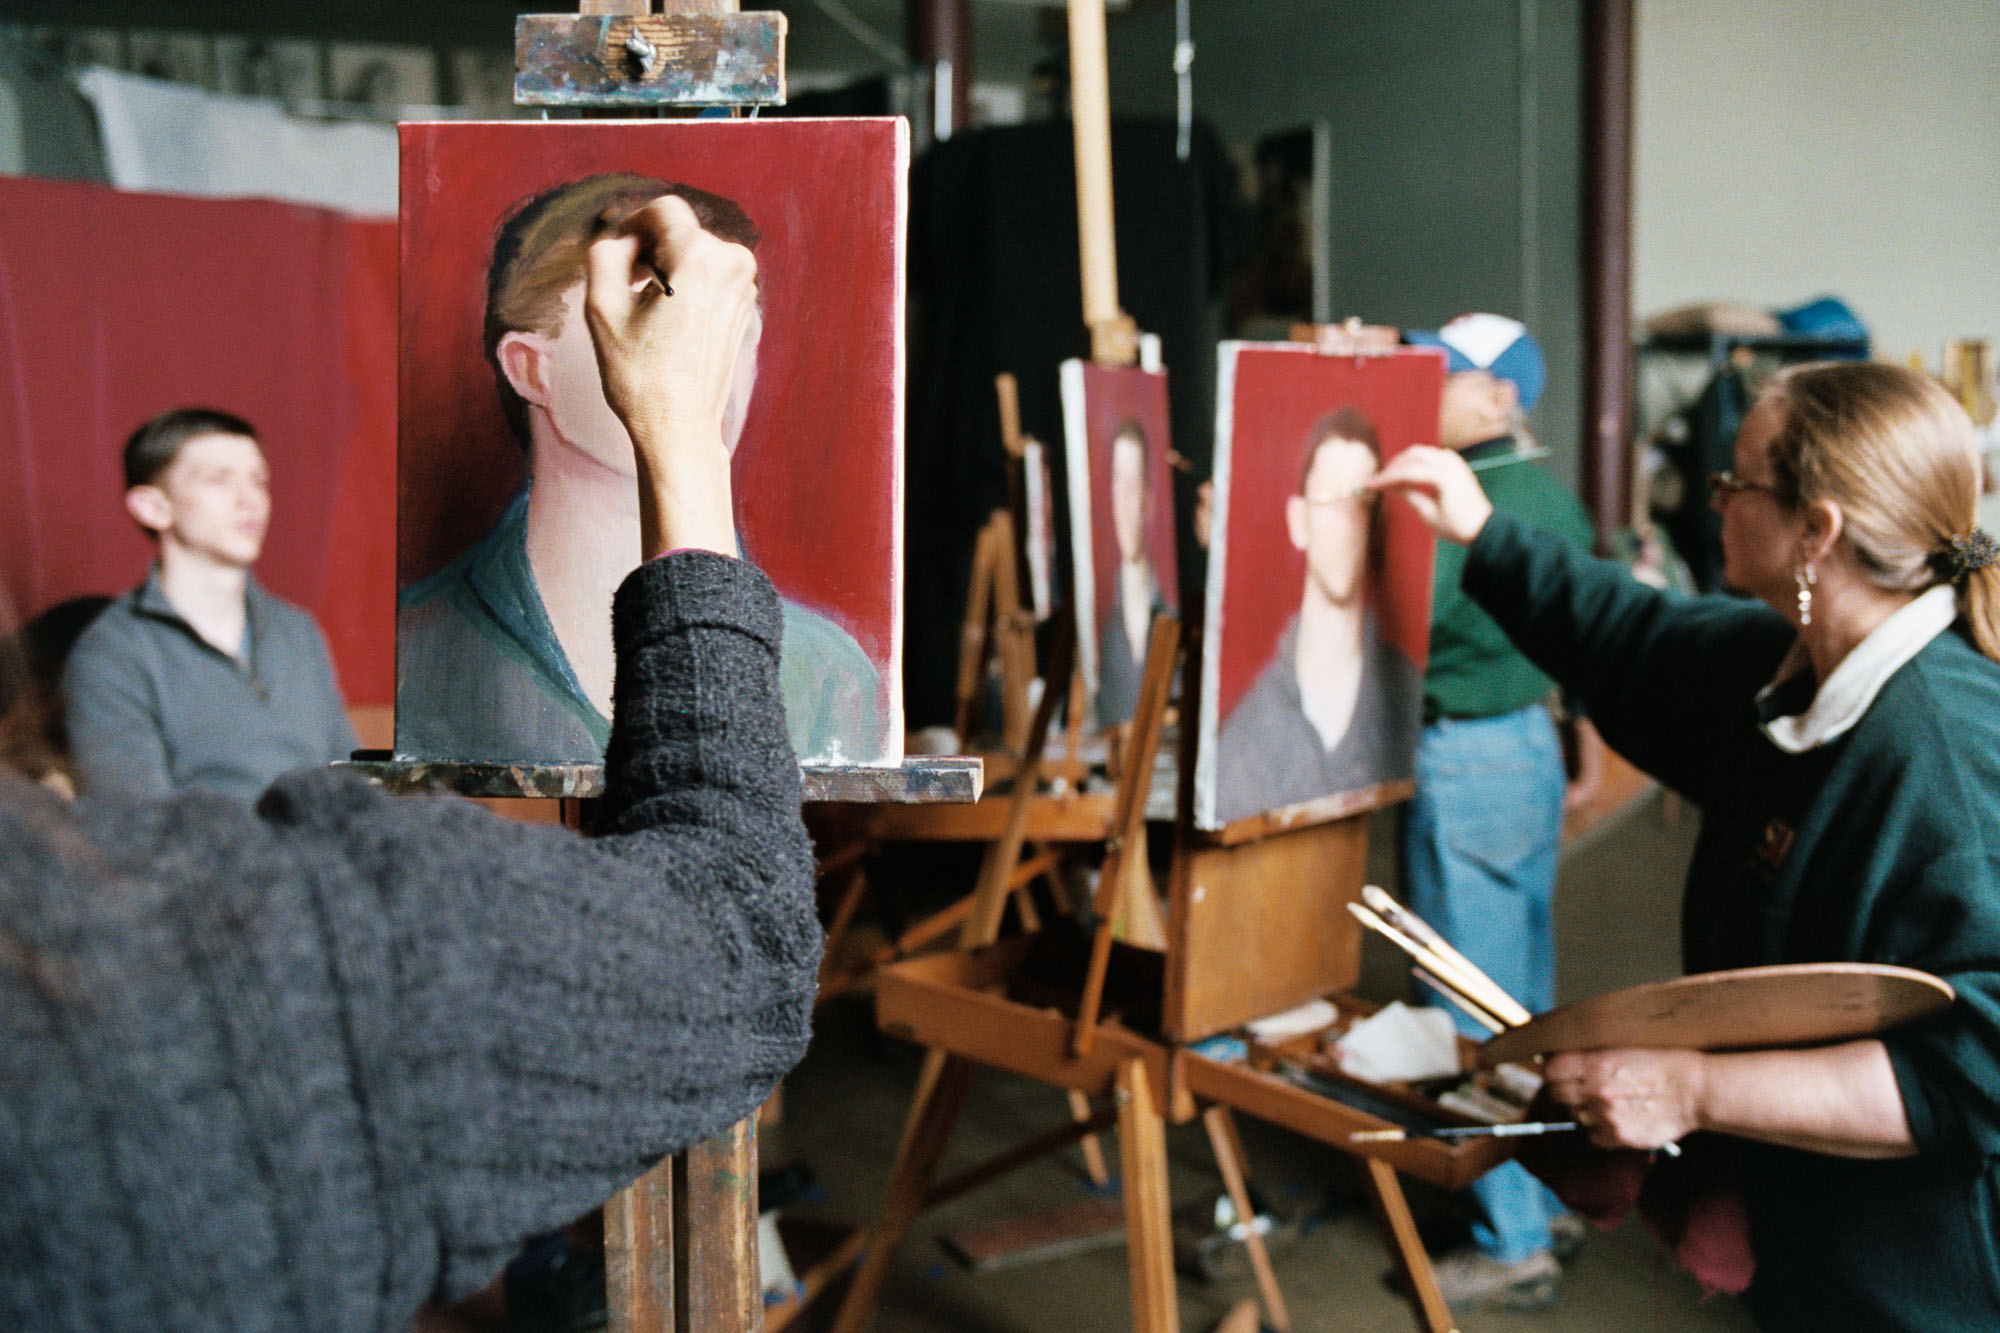 Ingbretson_atelier_by_Lomanno-9.jpg